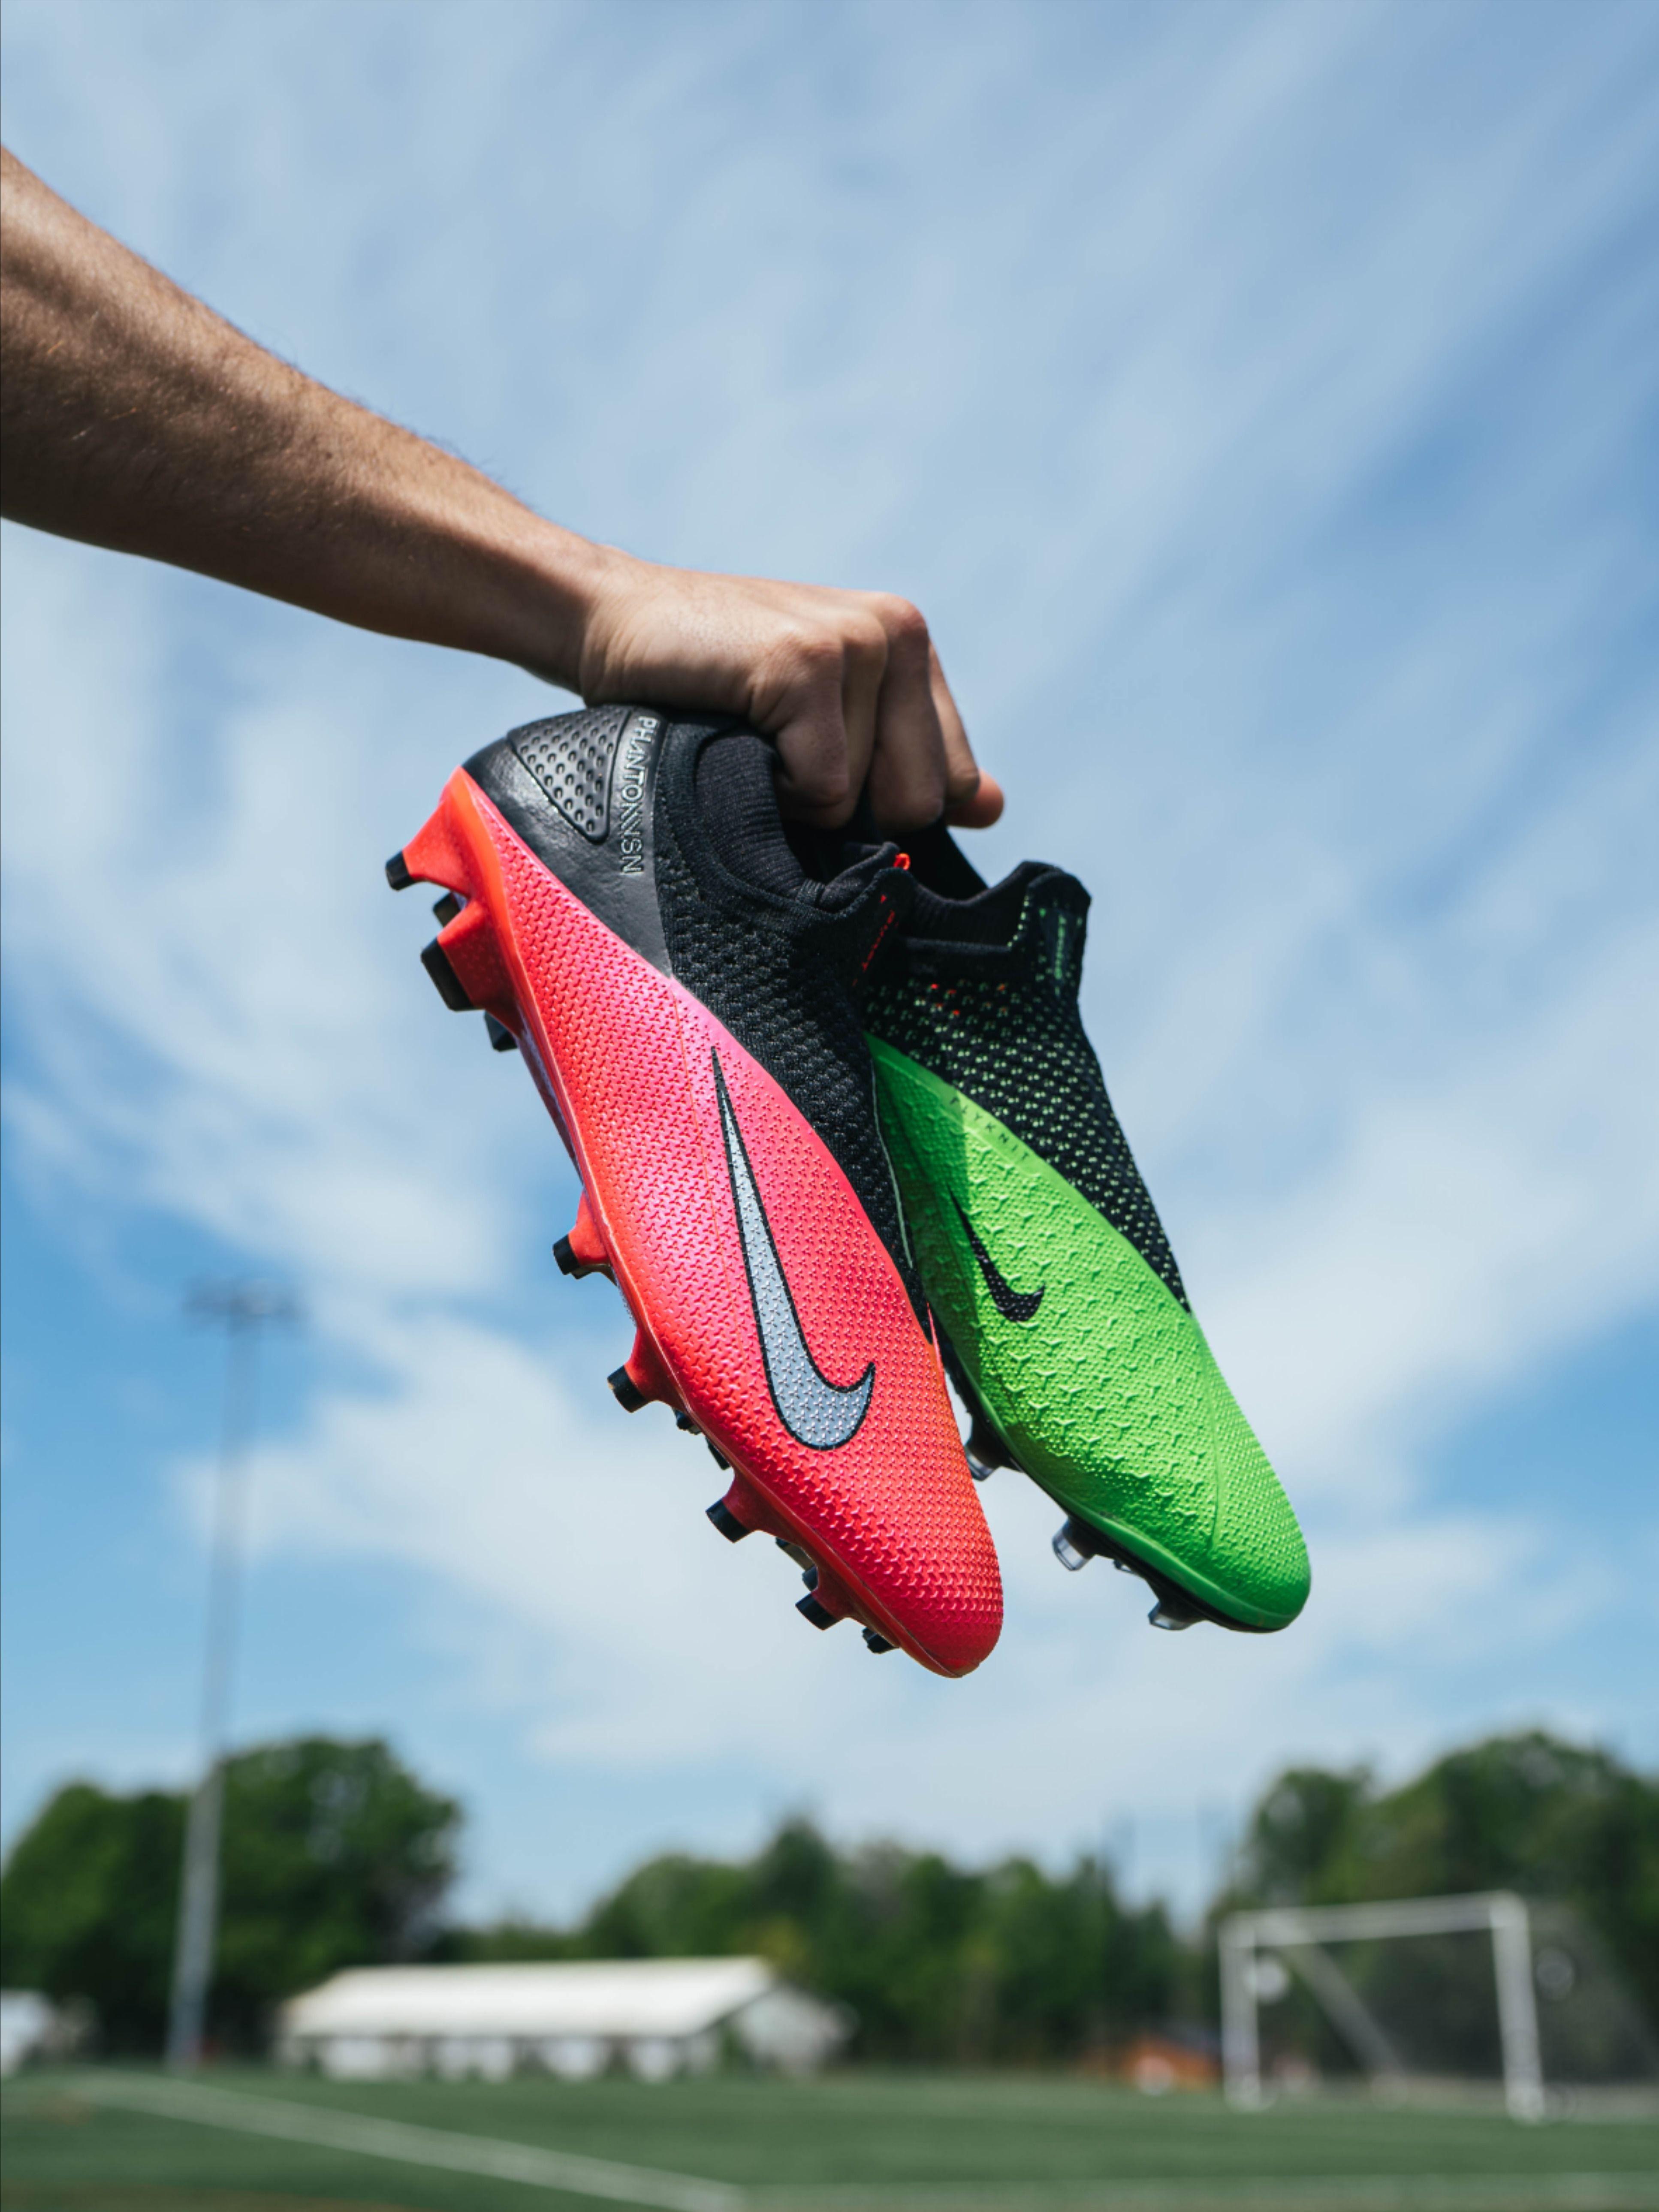 Nike Future Lab I And Ii Phantom Vision 2 Firm Ground Cleats In 2020 Soccer Gear Nike Football Nike